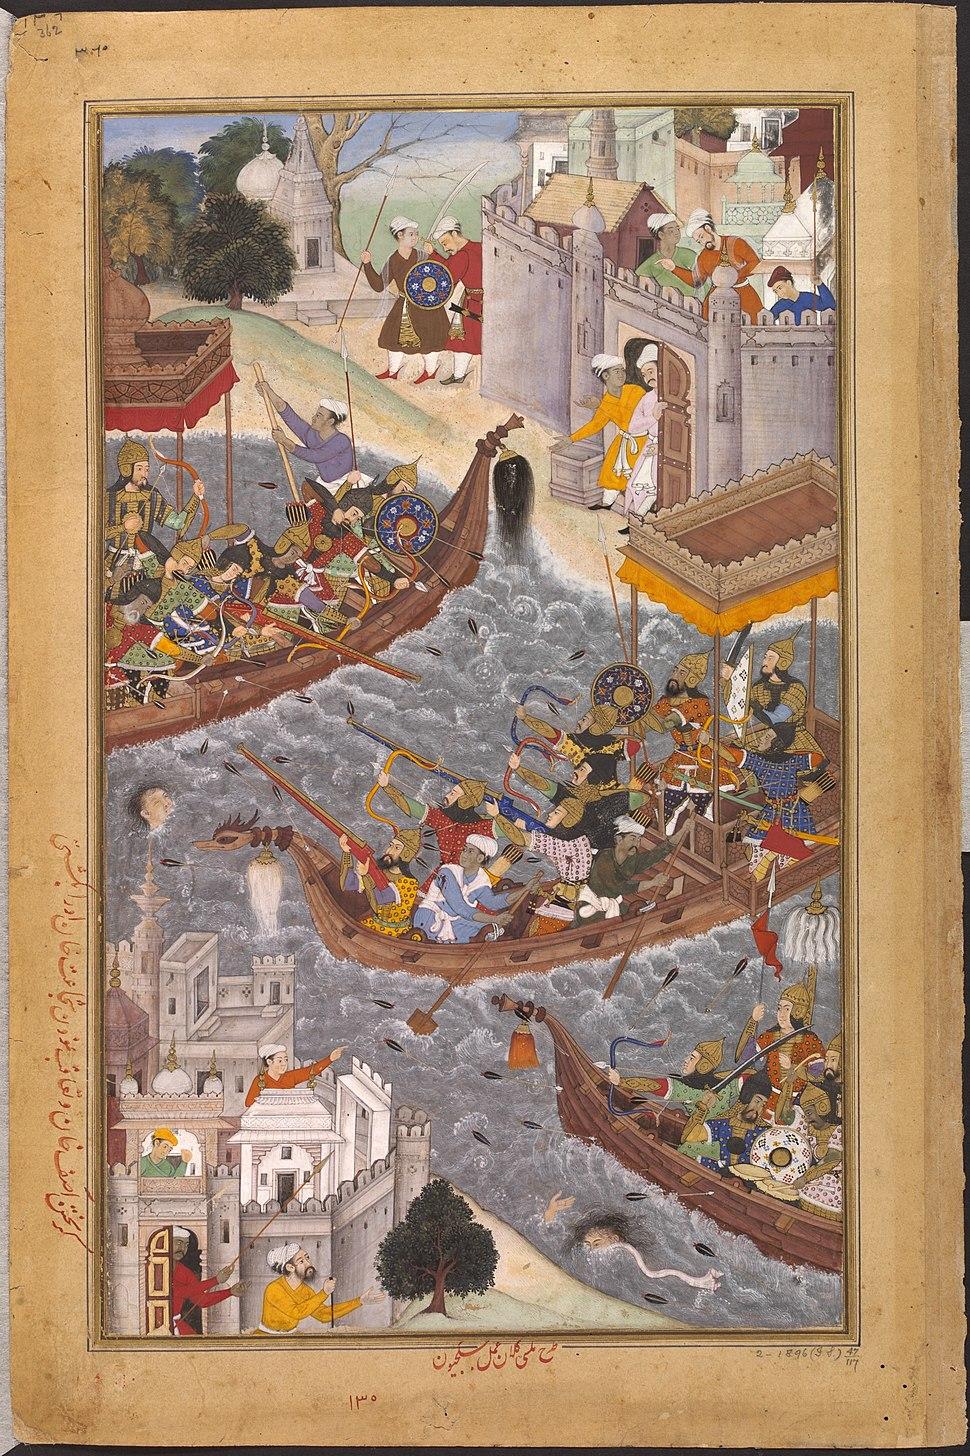 1565-Battle Scene with Boats on the Ganges-Akbarnama